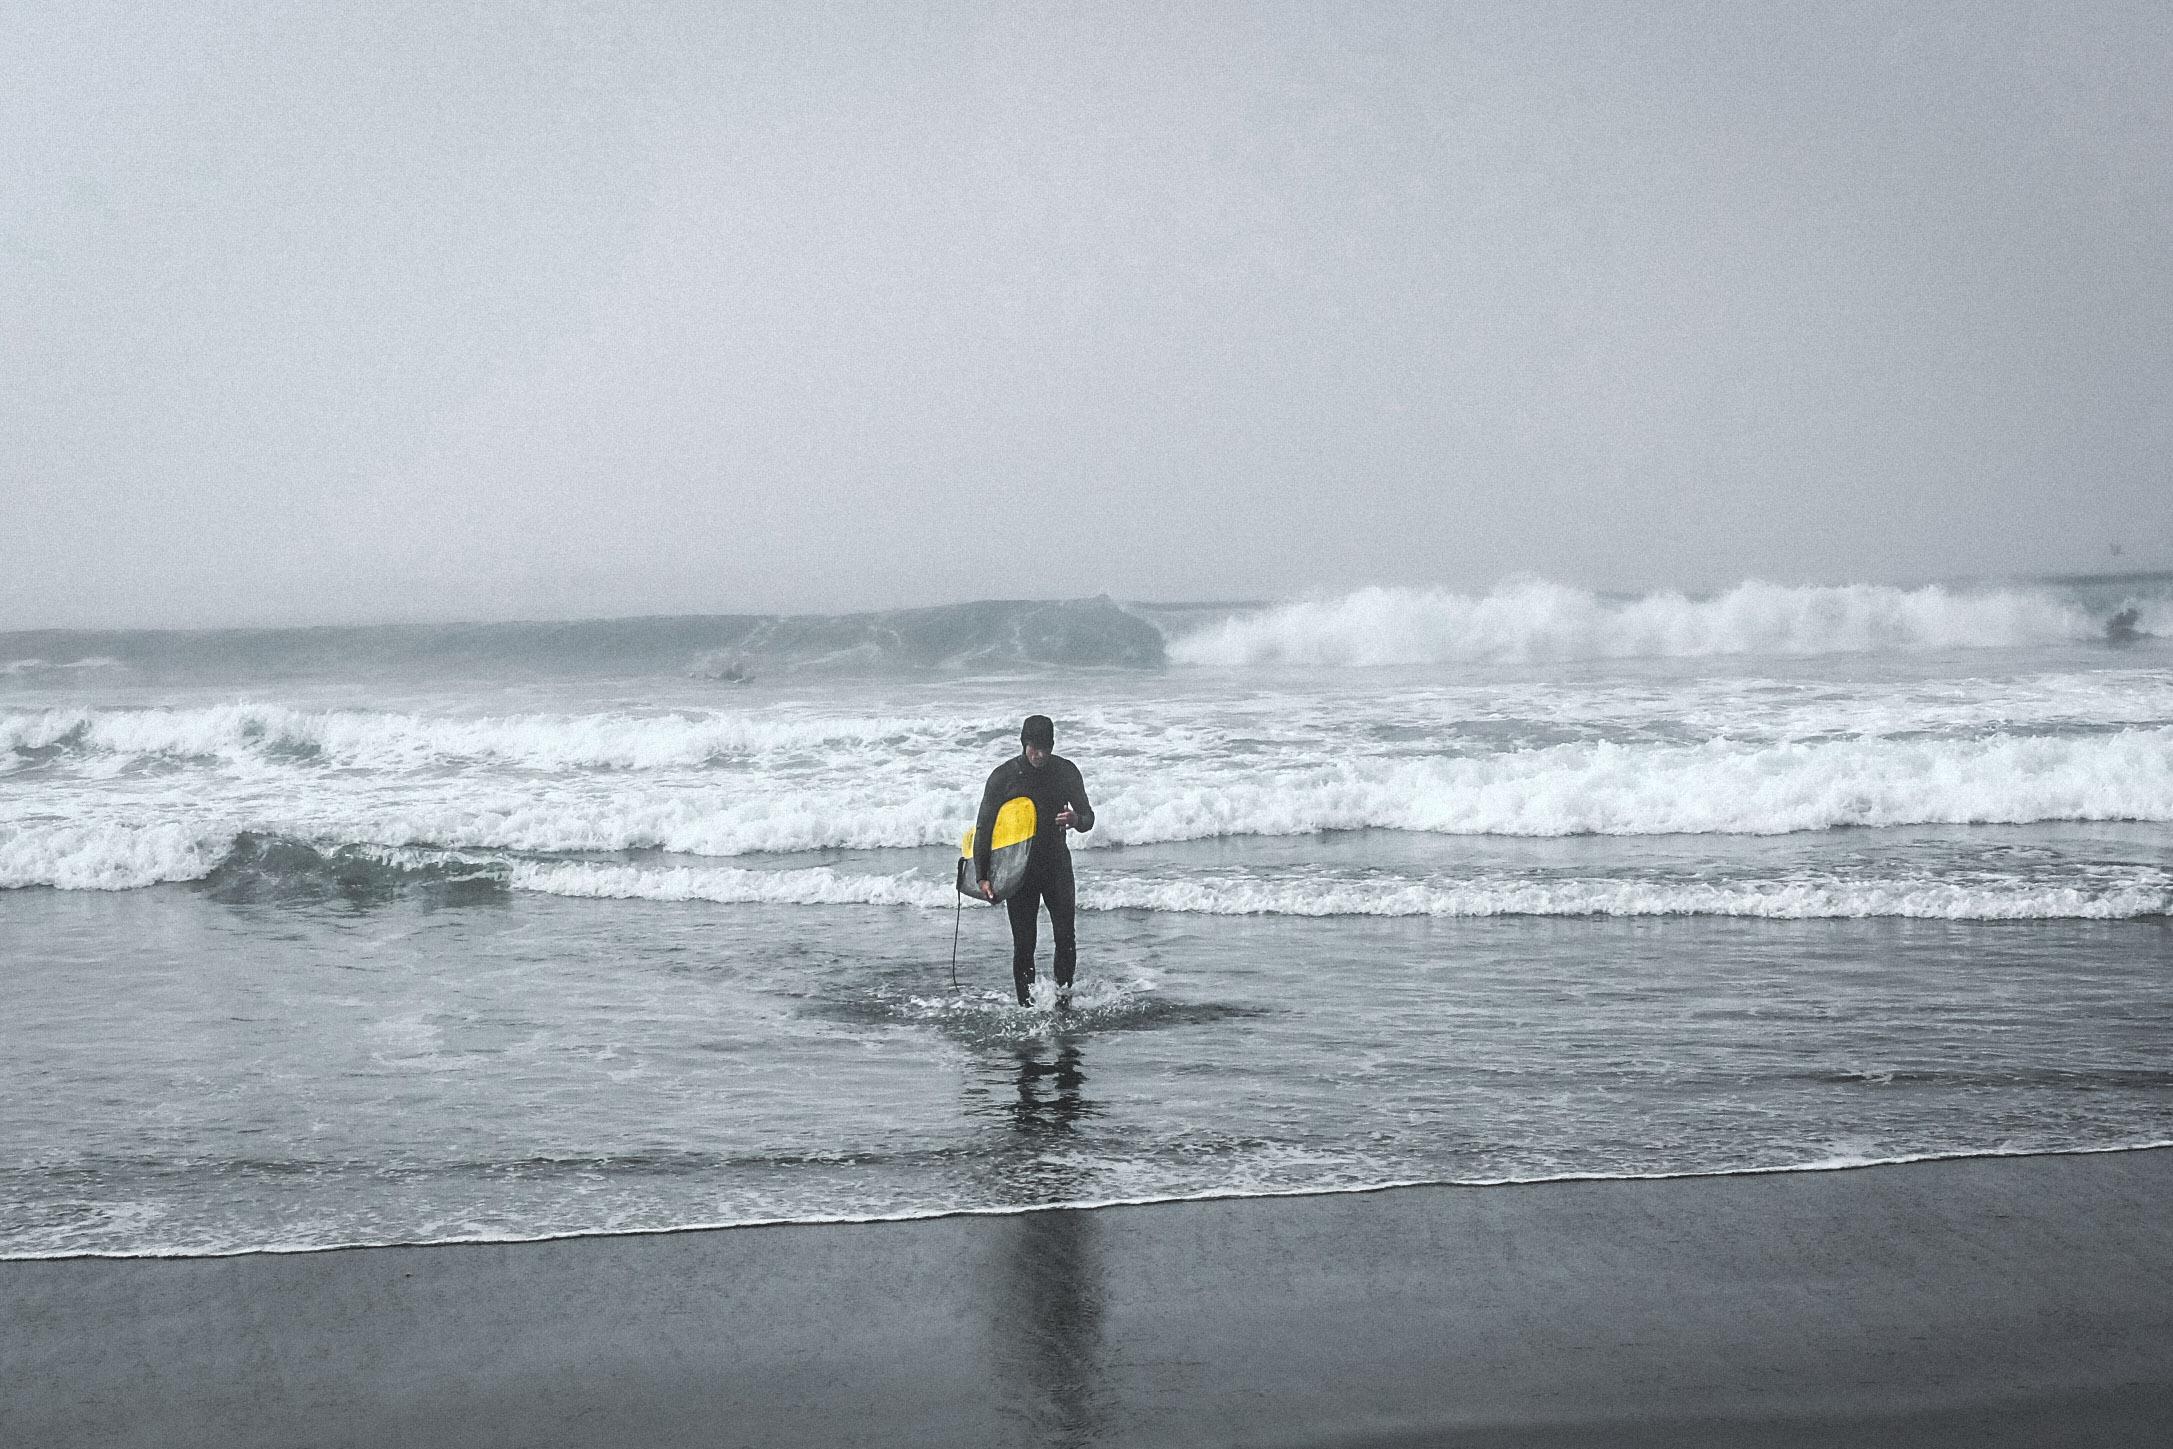 Black-Bear-Brand-Tilley-Surfboards-Water-Testing-09.jpg